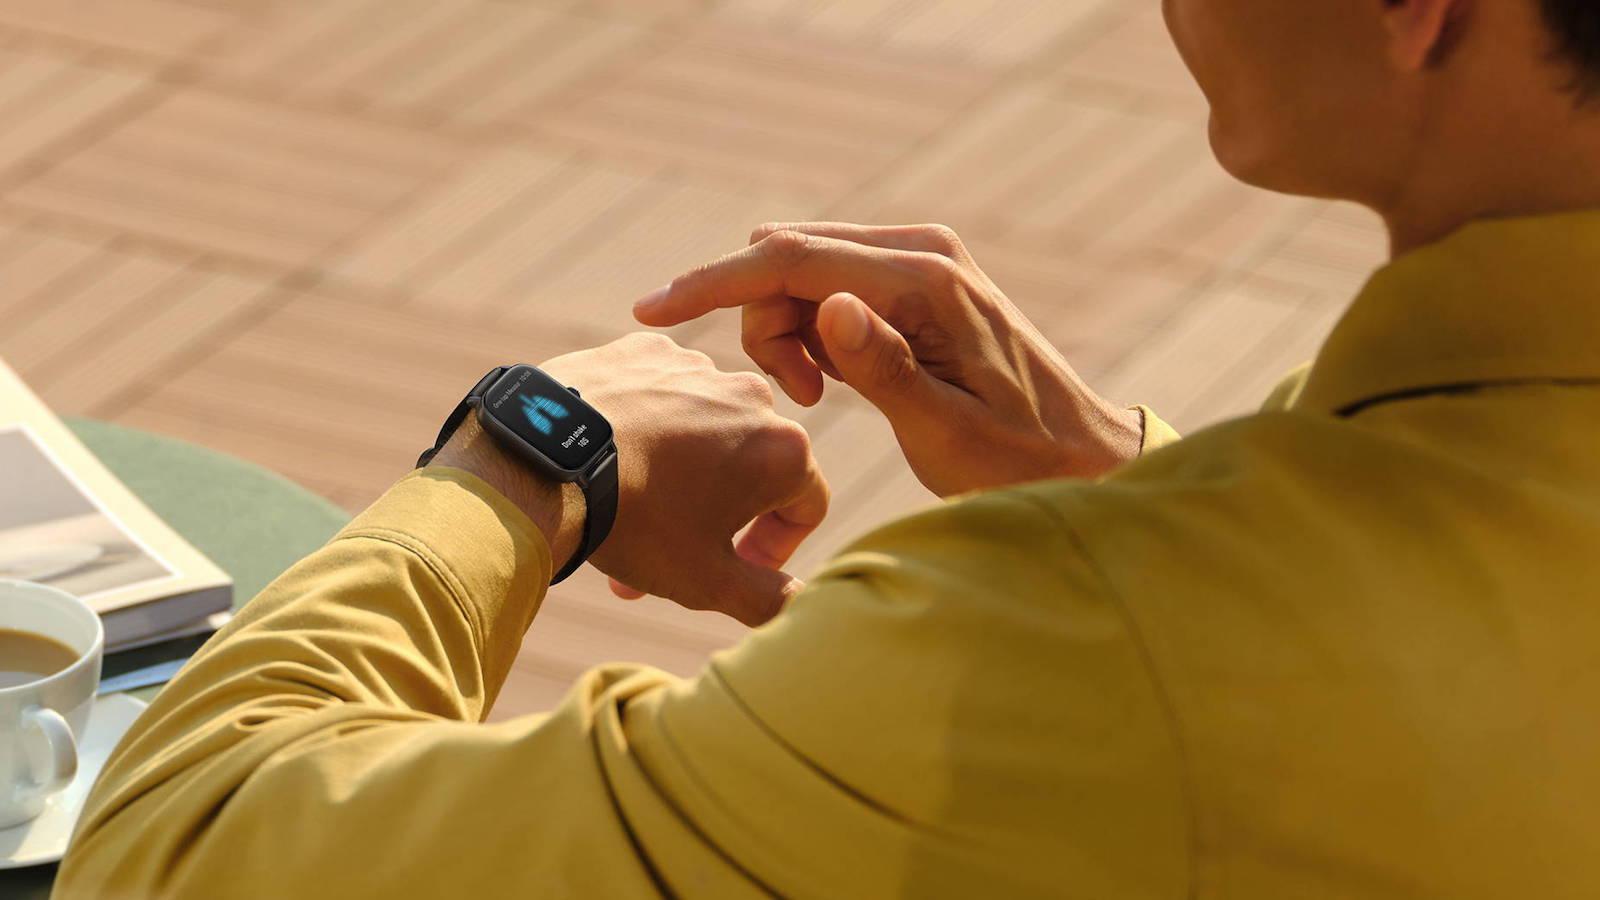 Amazfit-GTS-3-sleek-smartwatch-01.jpeg